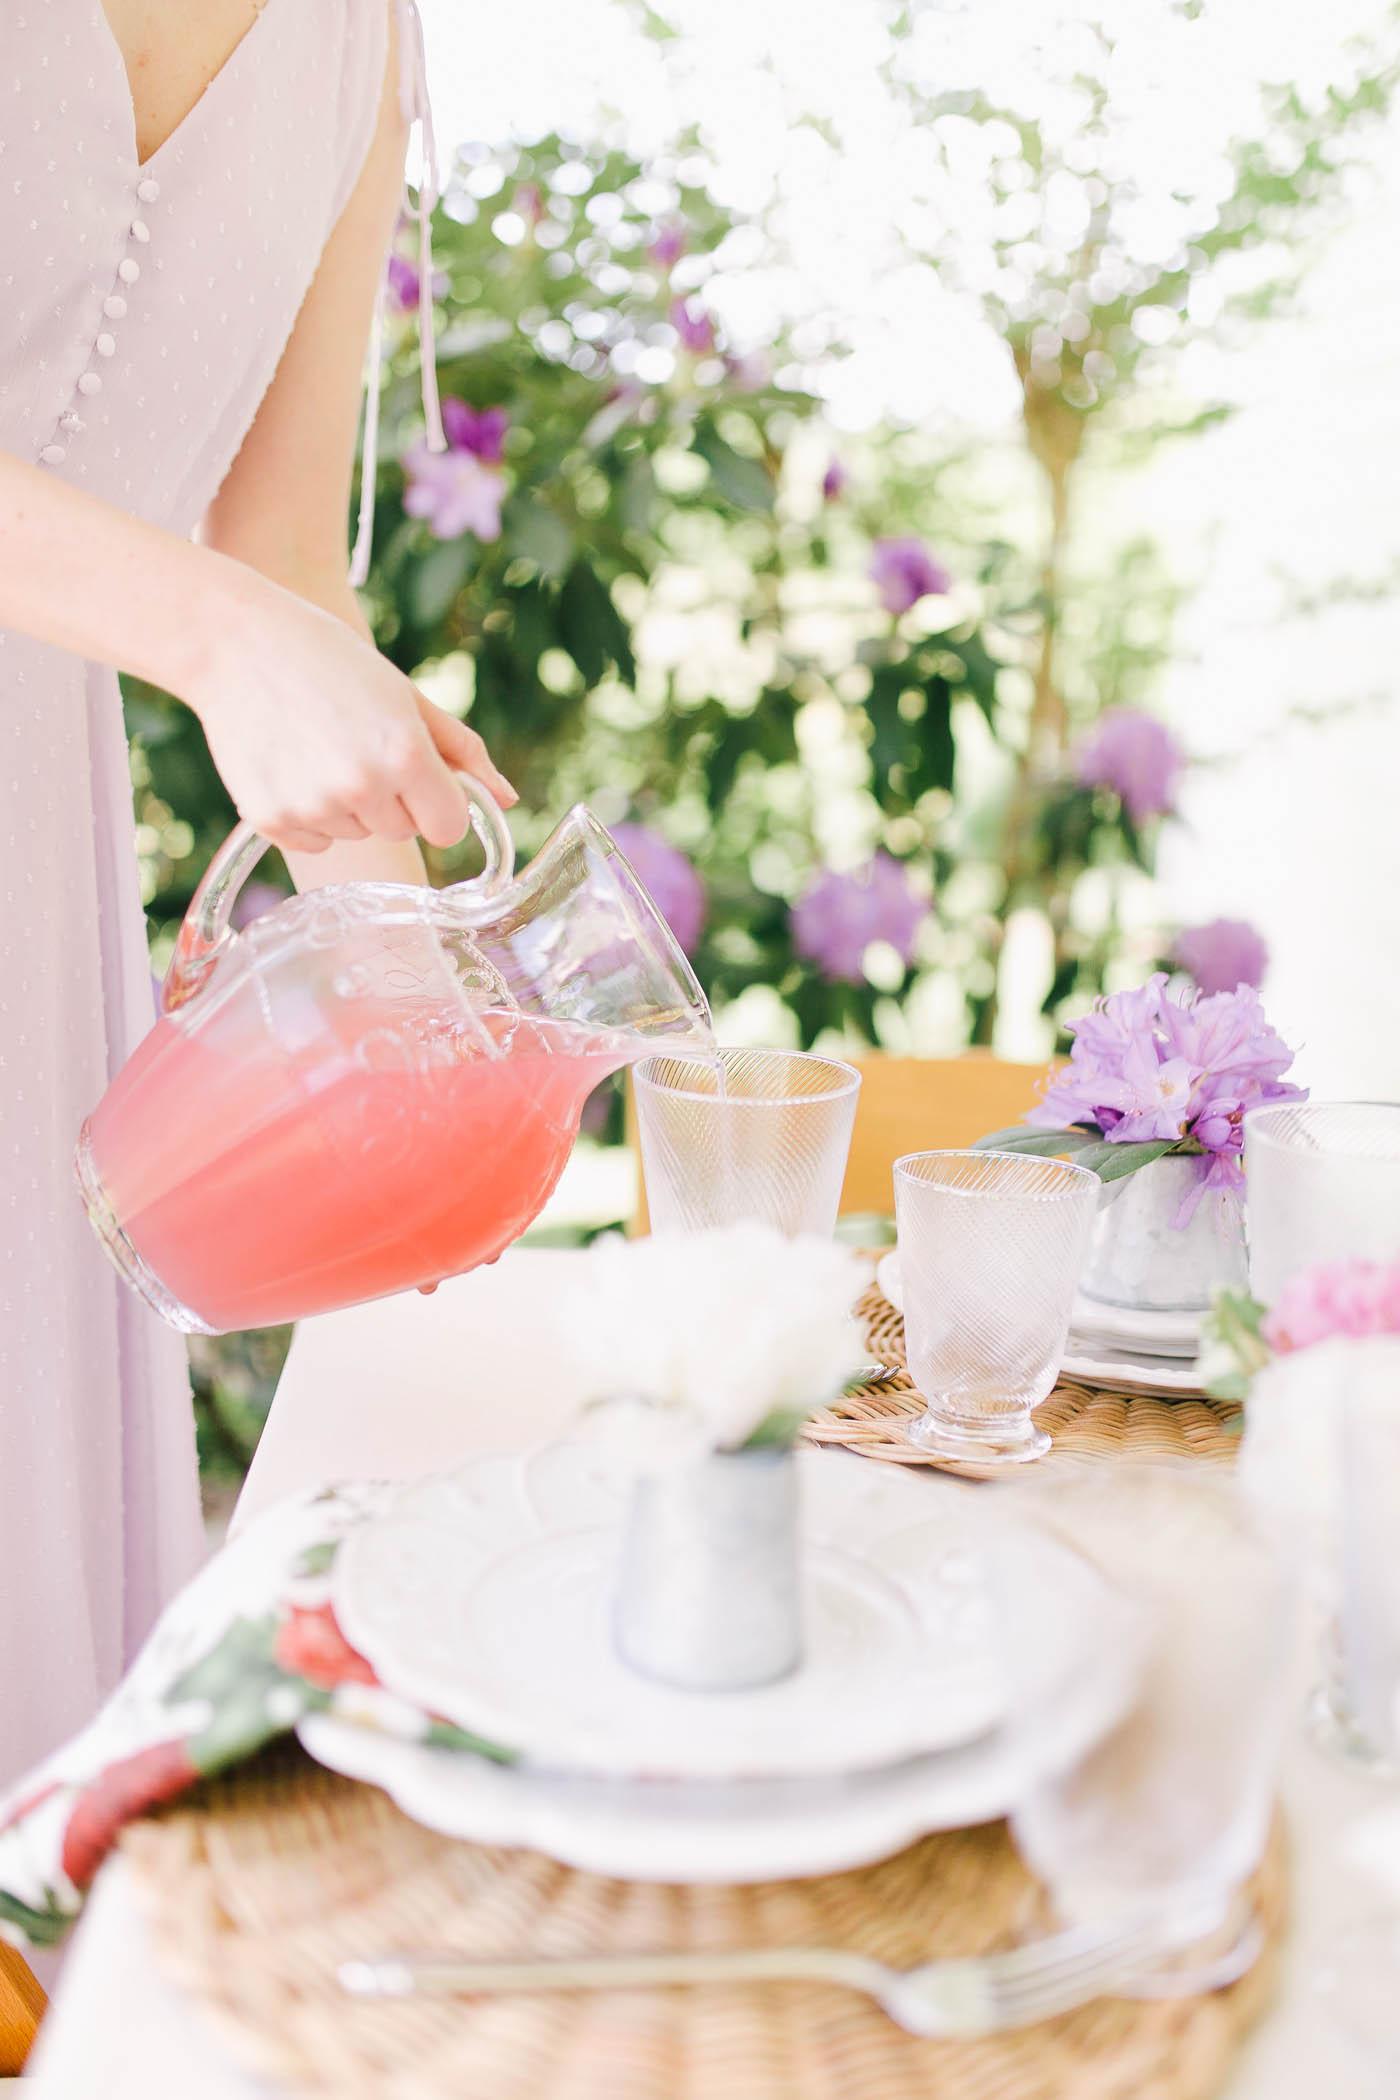 feminine-garden-themed-mother's-day-ladies-lucheon